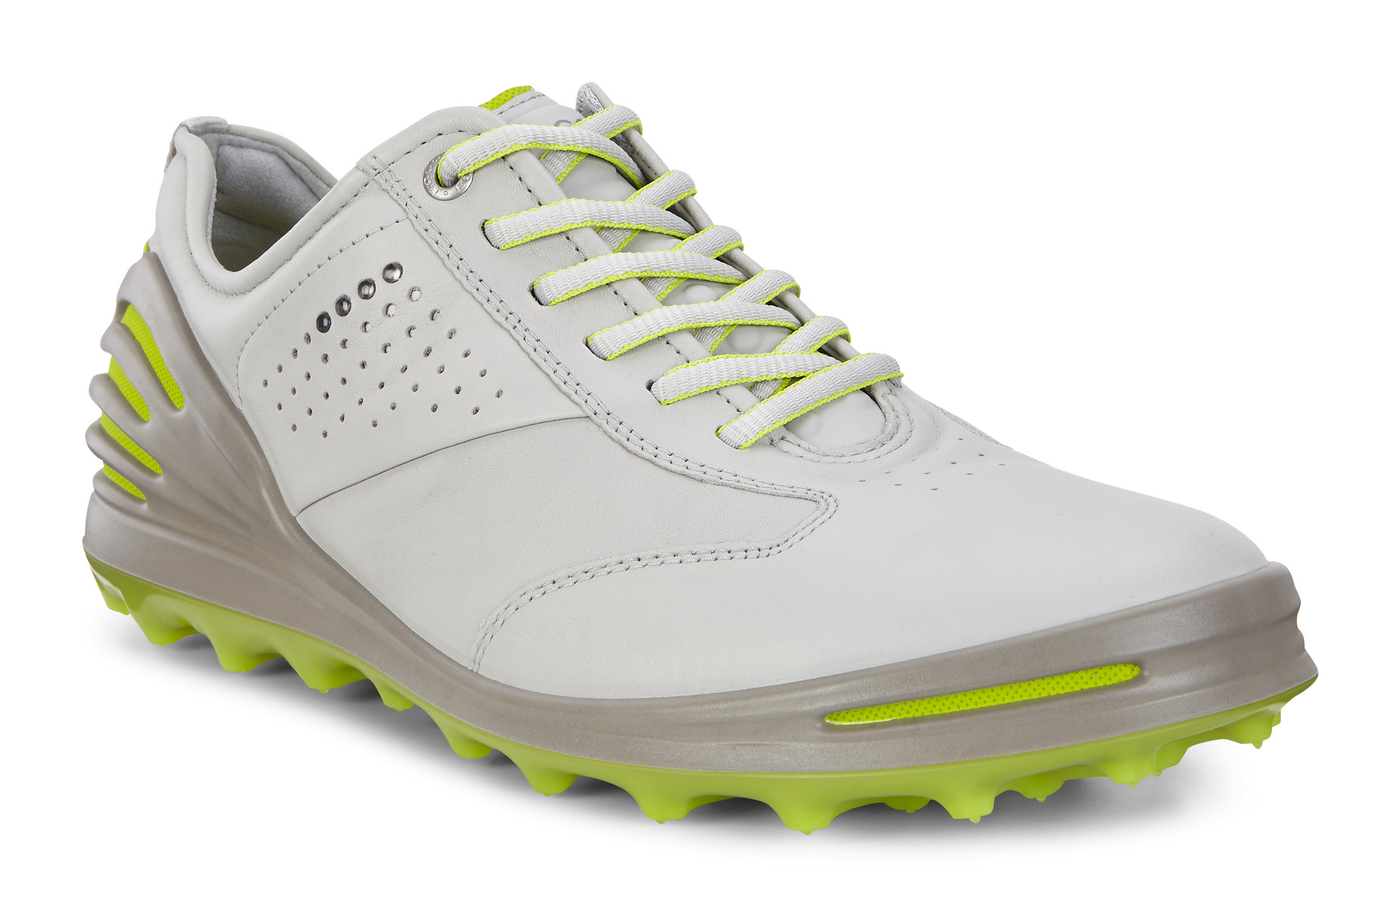 ECCO CAGE PRO Mens Golf